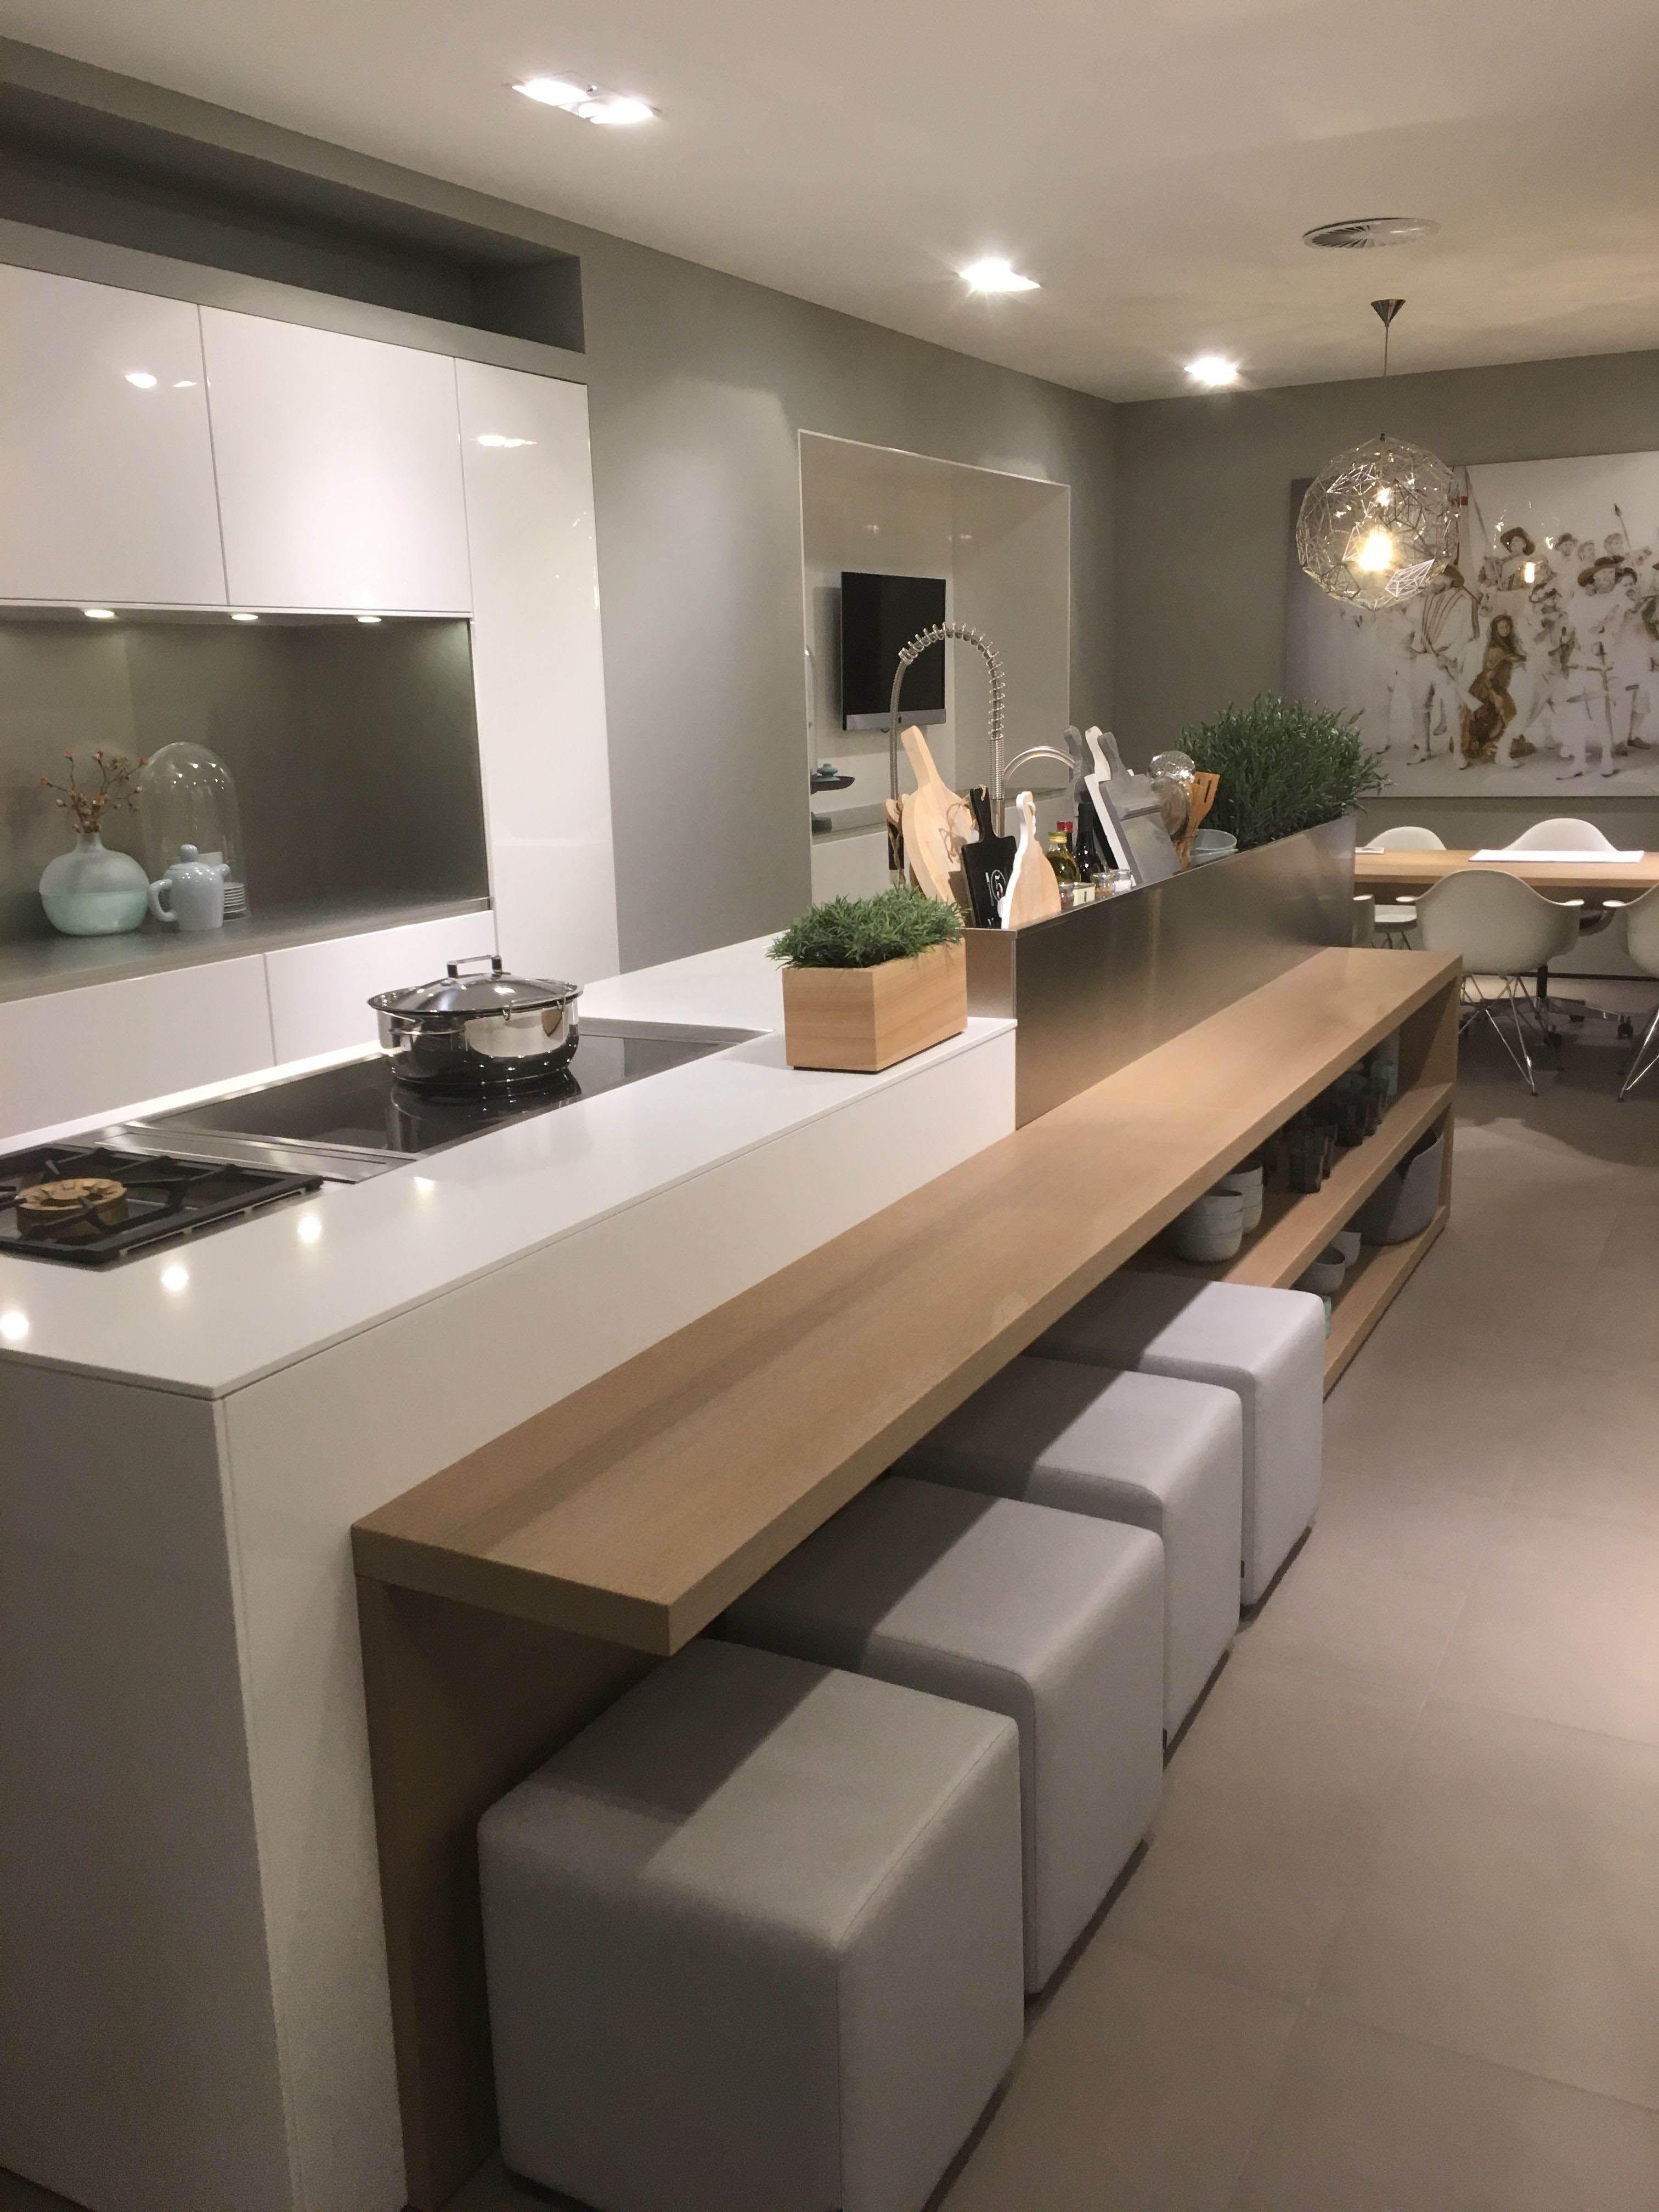 Modern Kitchen Area Style Ideas Modern Kitchen Design Kitchen Design Home Decor Kitchen